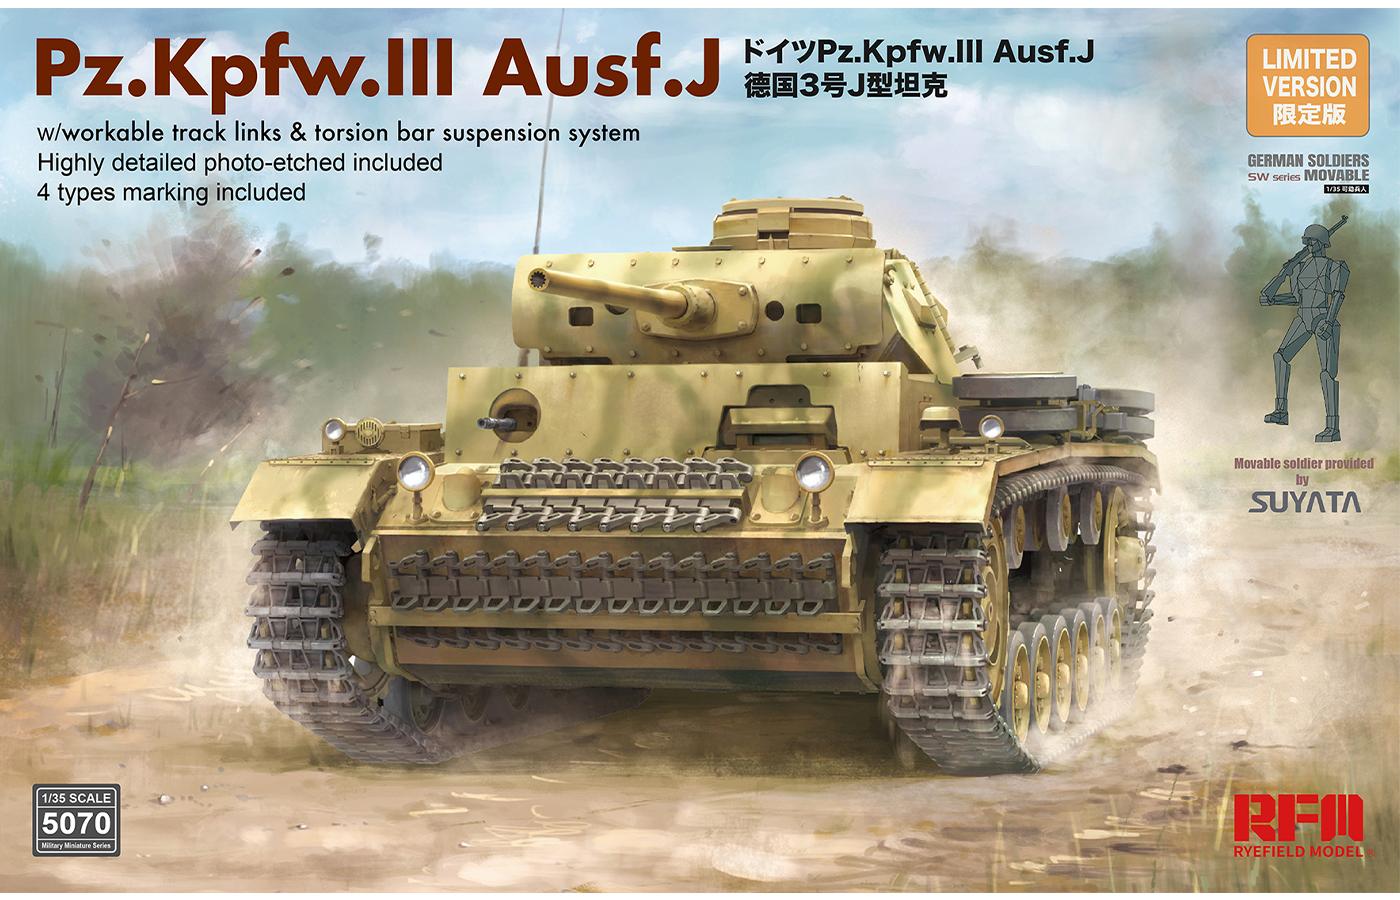 RM-5070 Pz.Kpfw.III Ausf.J